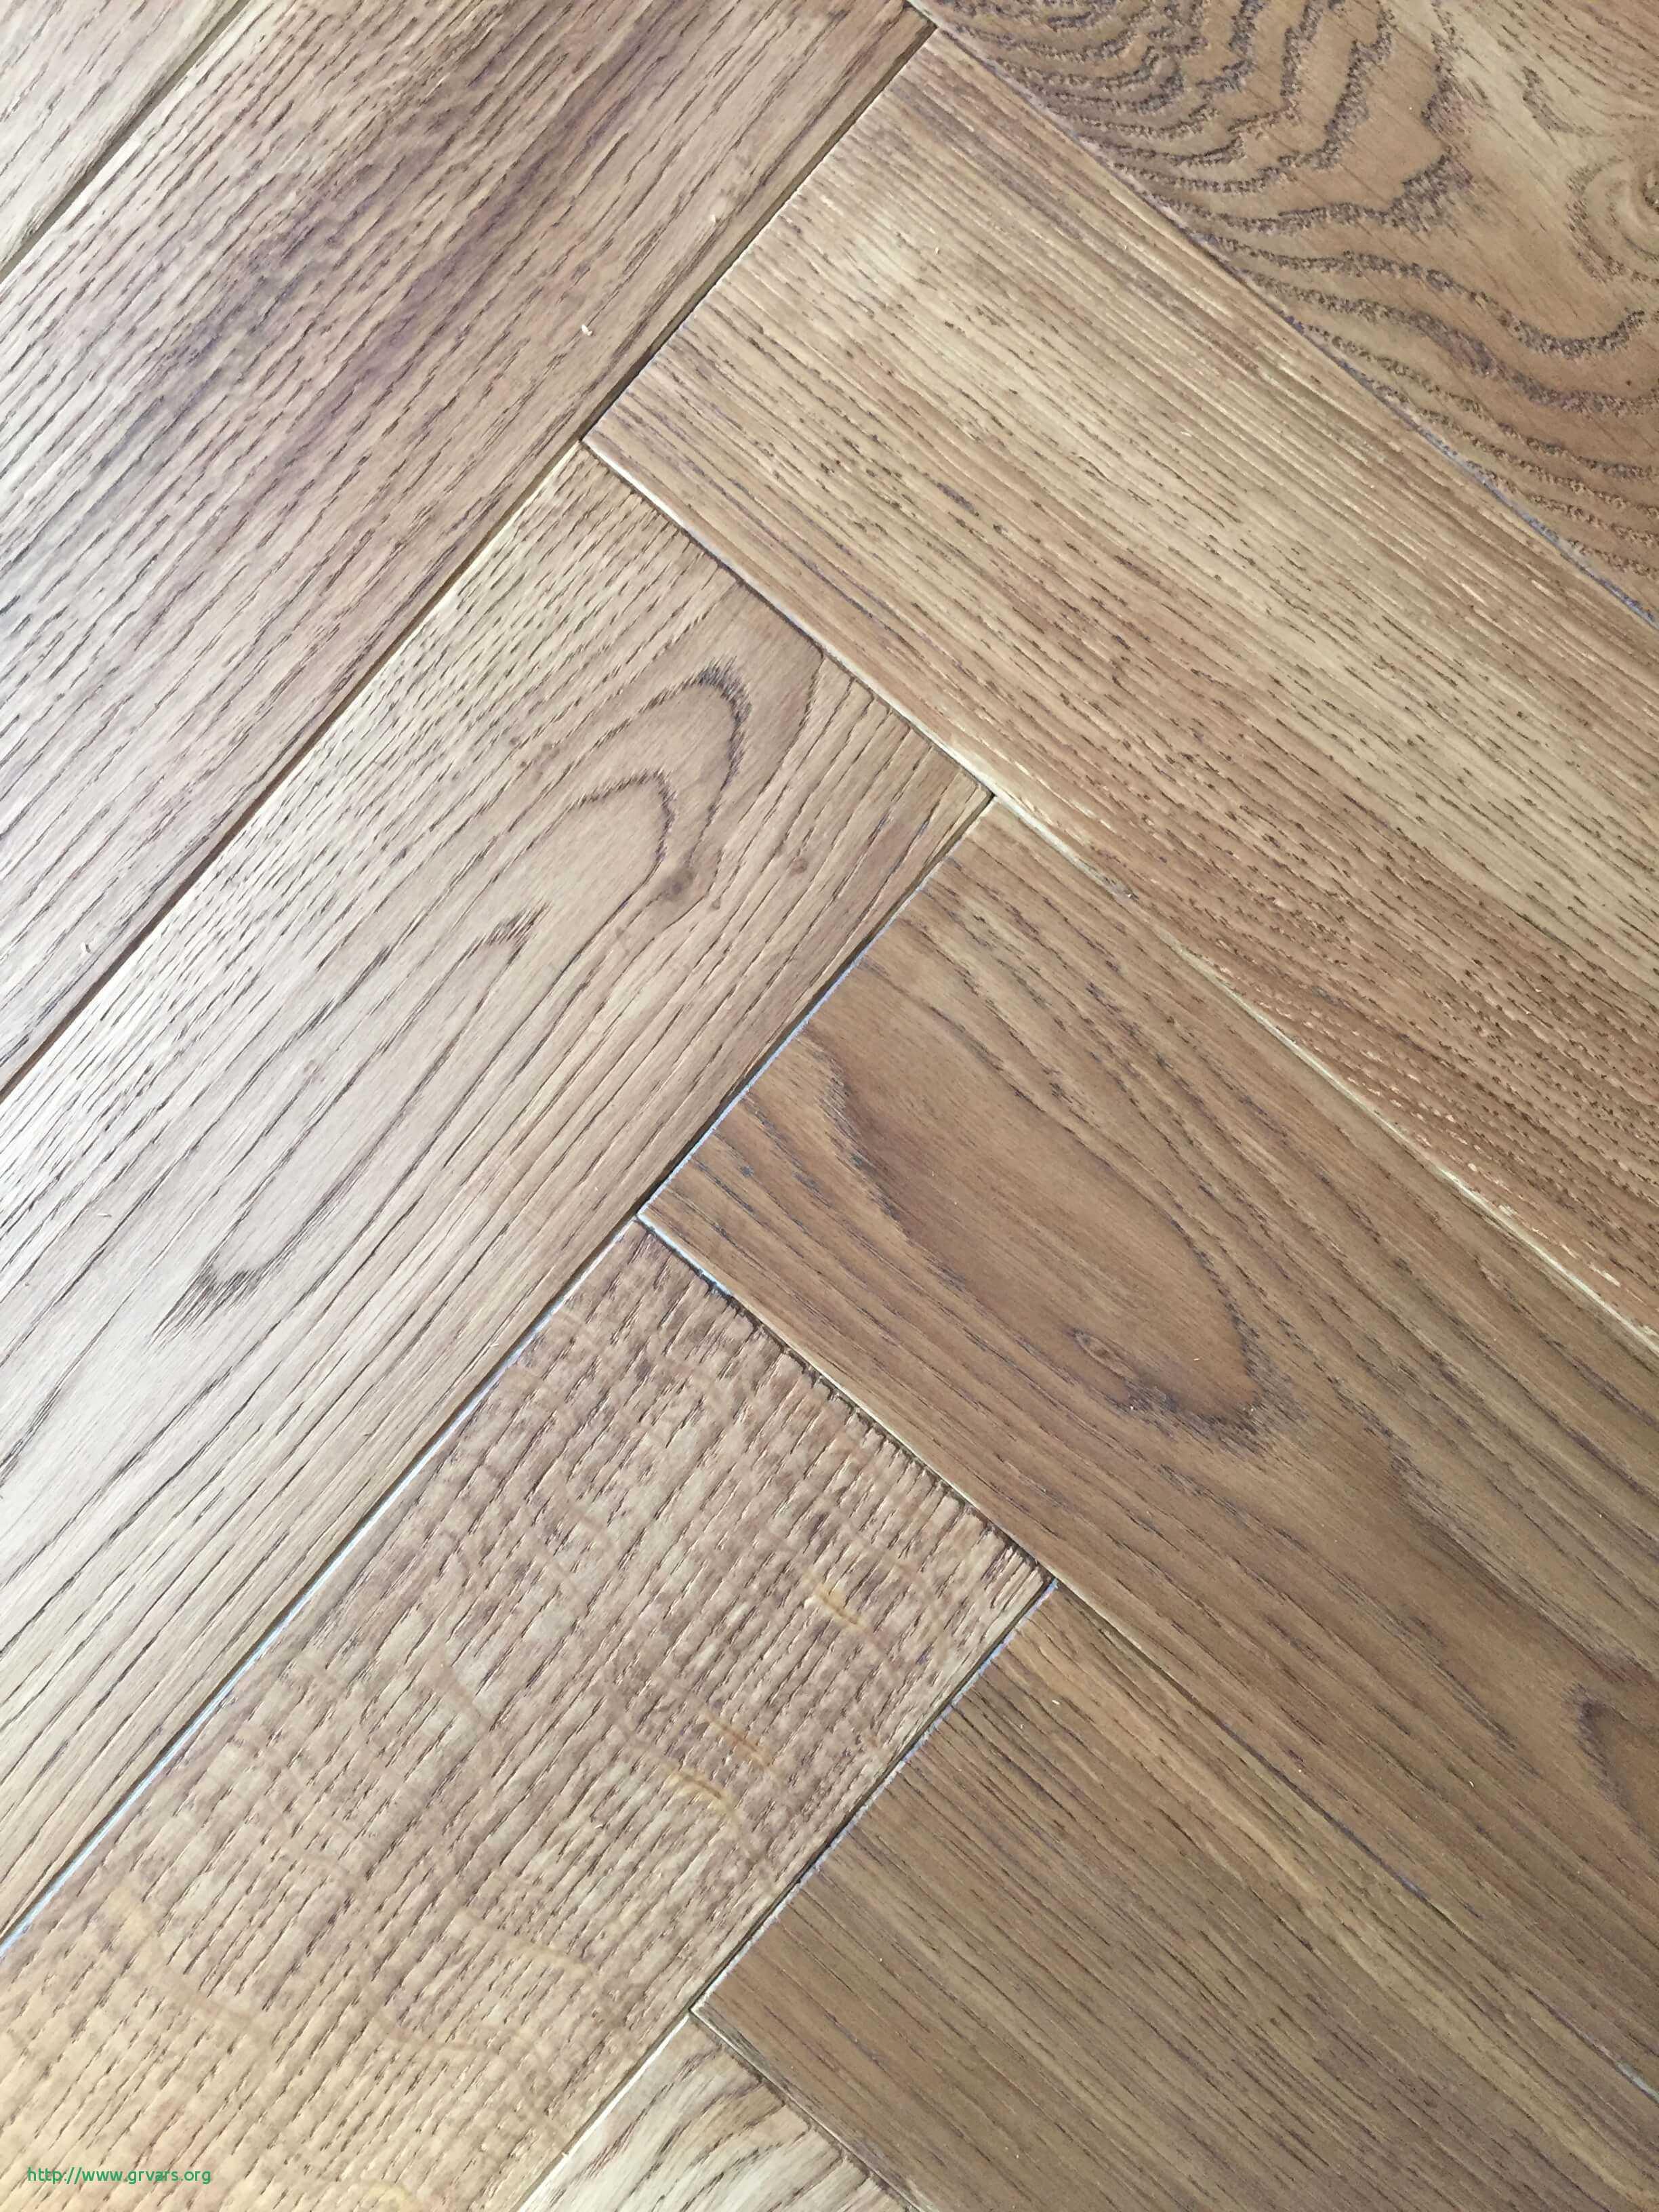 vinyl plank flooring vs hardwood of 21 meilleur de what is better laminate or vinyl flooring ideas blog for what is better laminate or vinyl flooring frais laminate flooring ideas